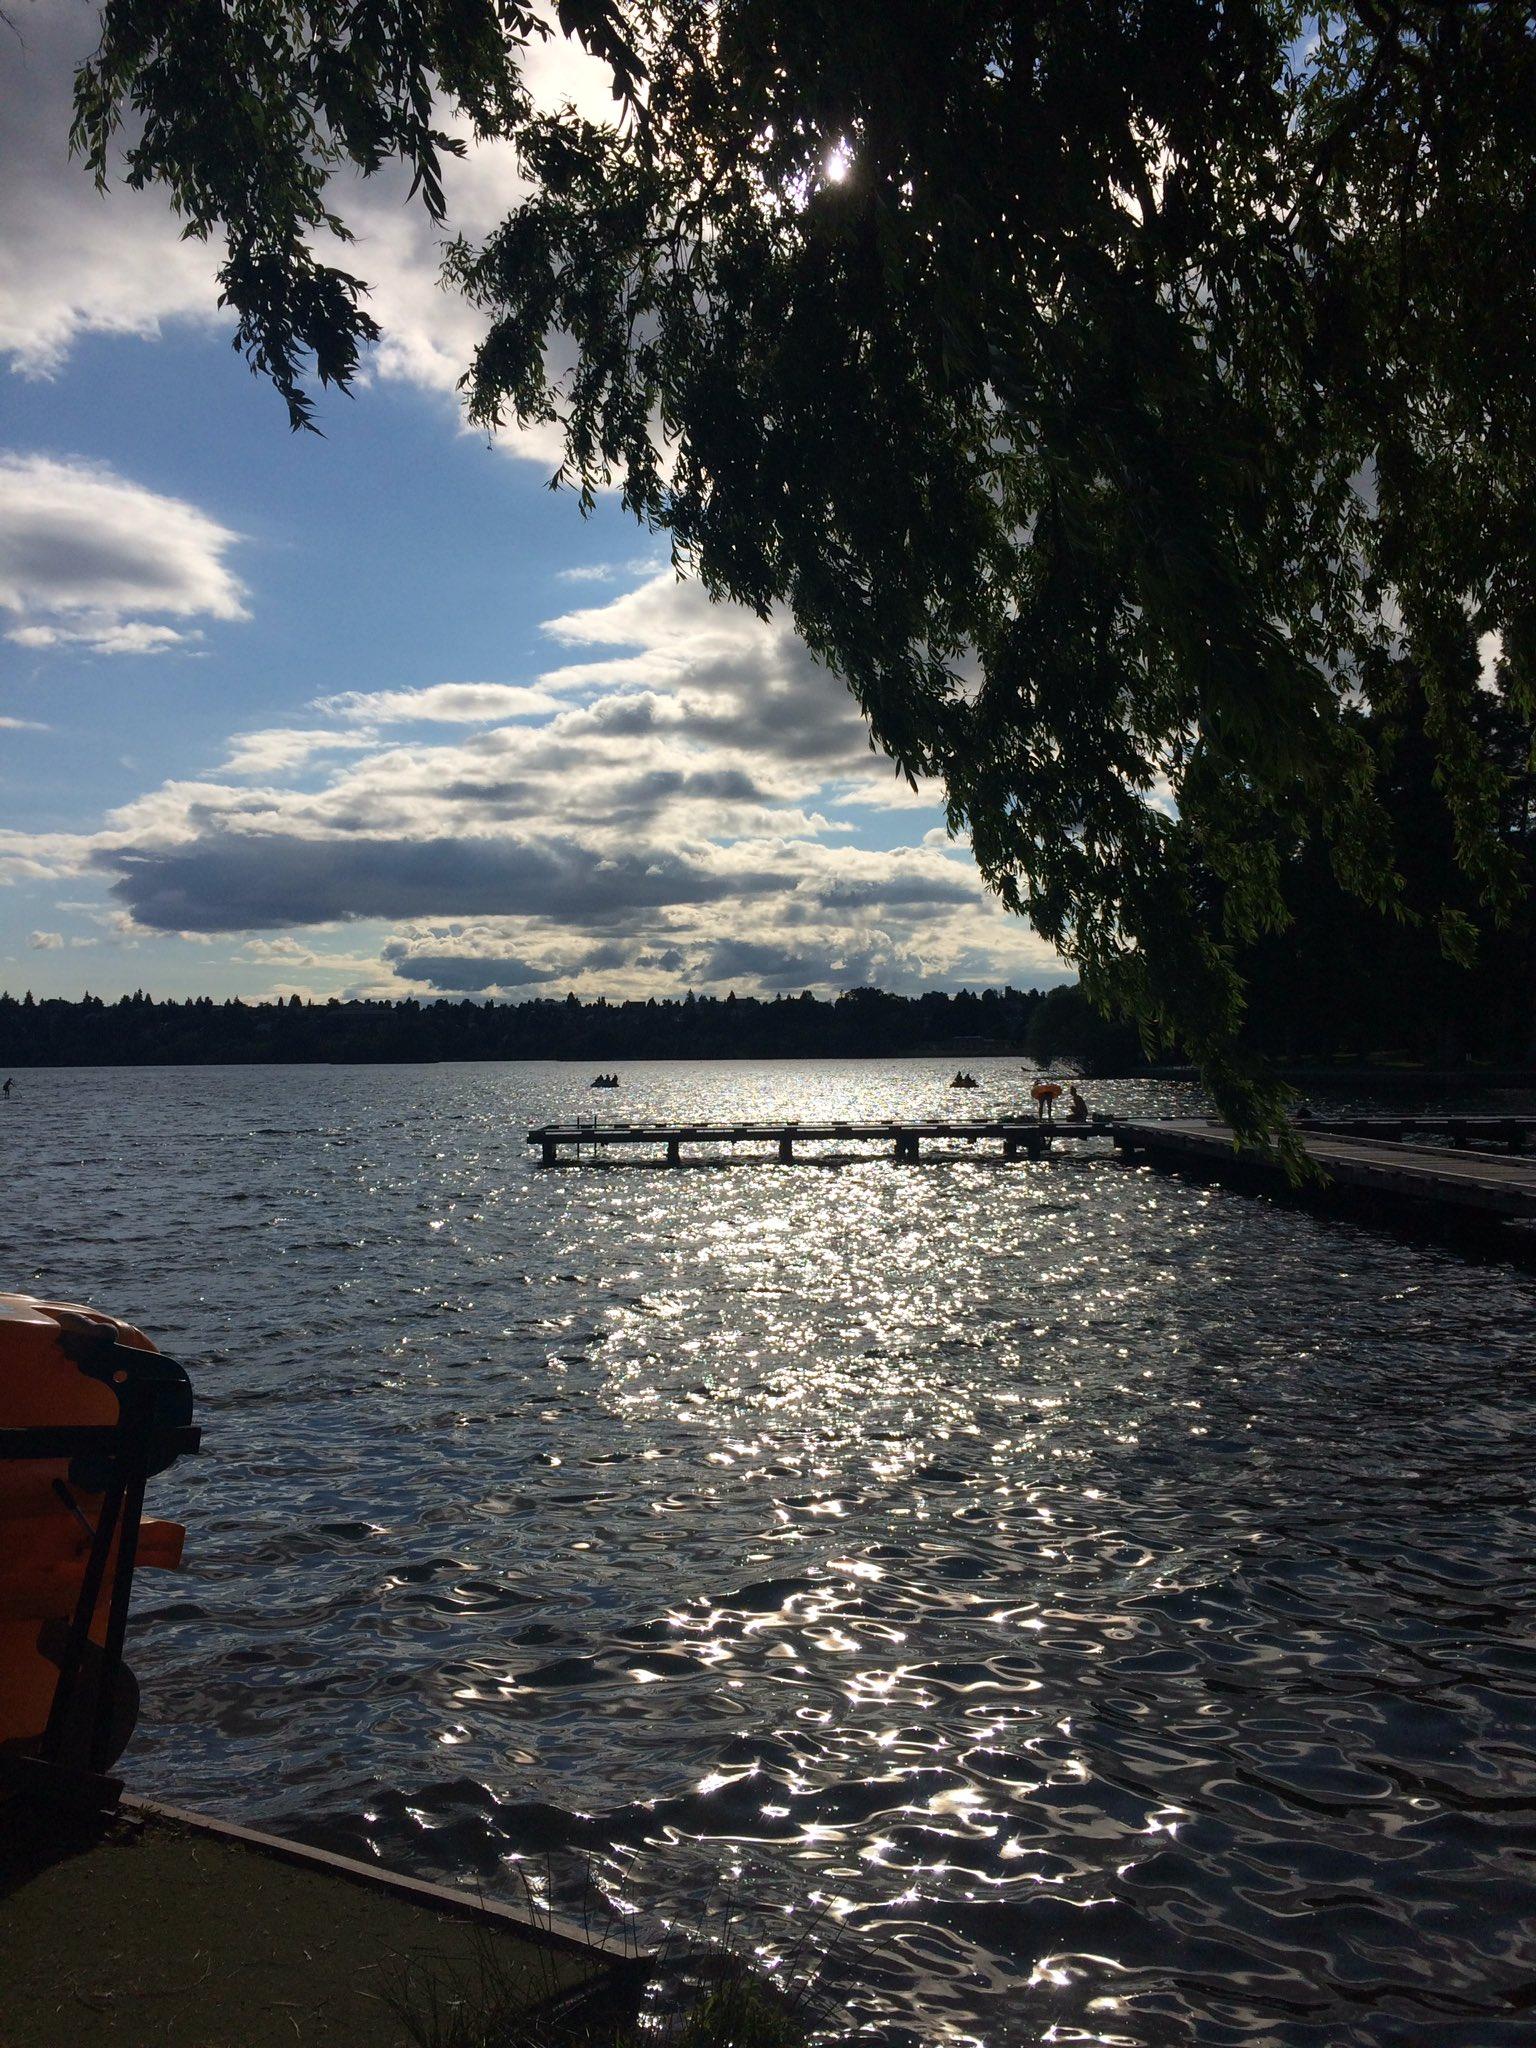 I'm currently enjoying the beautiful city of Seattle!  Walking around Green Lake and tweeting. #lamazechat https://t.co/yFyyKVoy1u